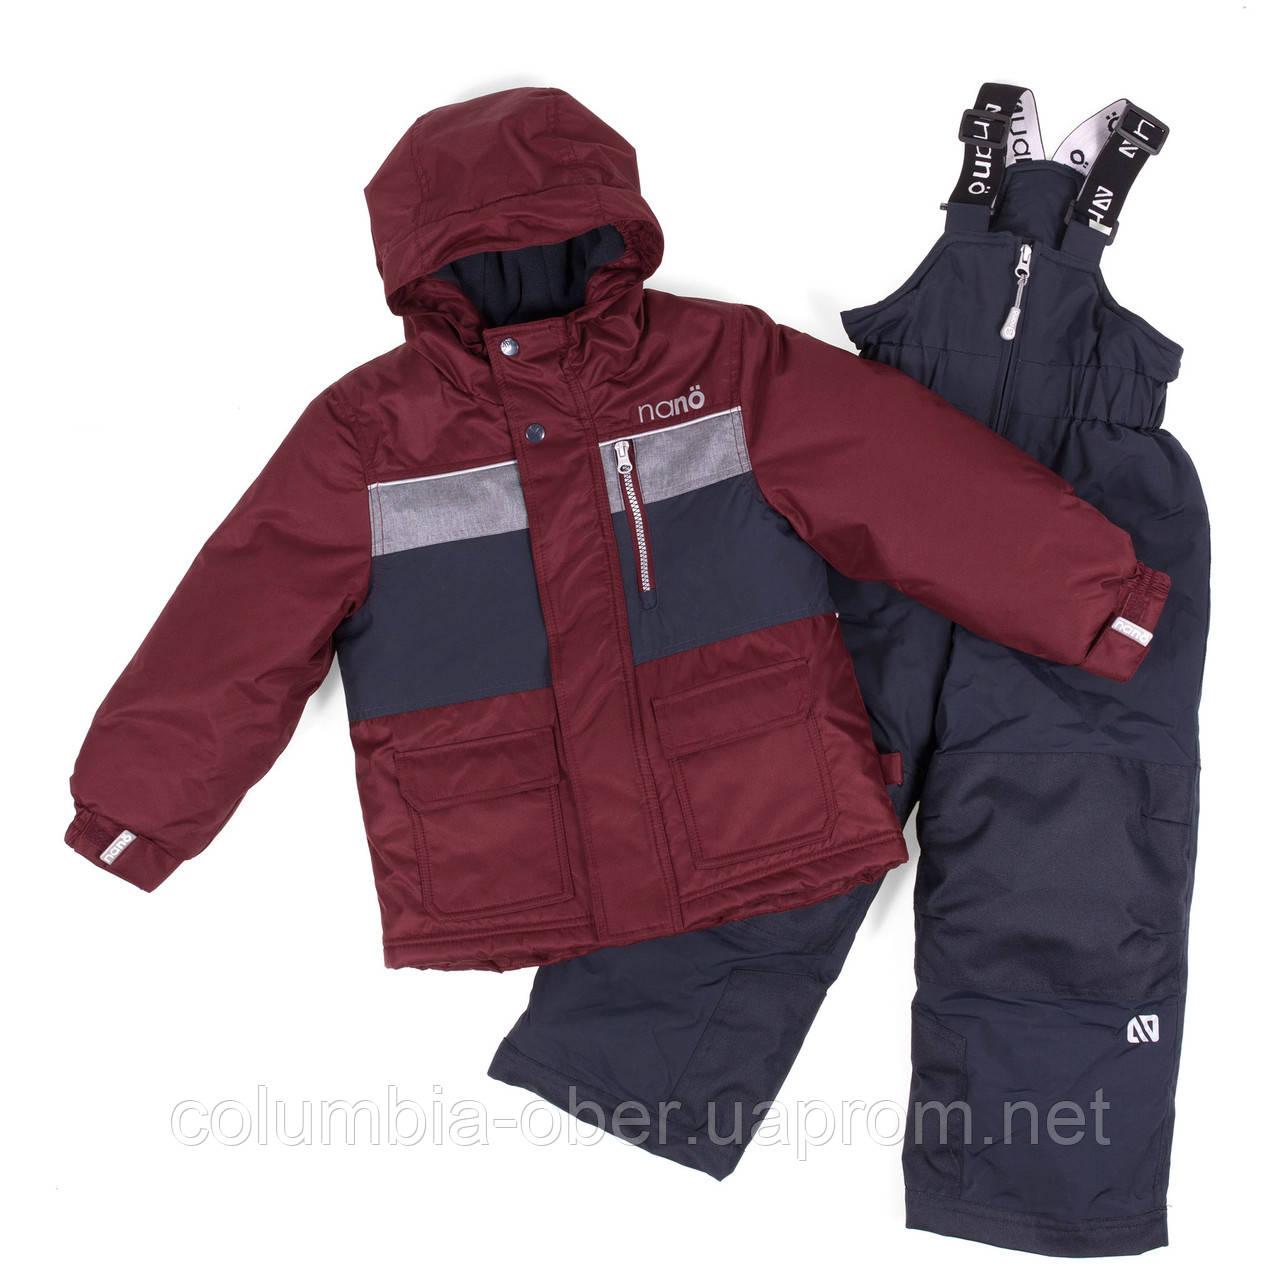 Зимний комплект для мальчика NANO F18 M 273 Red Leaf. Размеры 2-12.